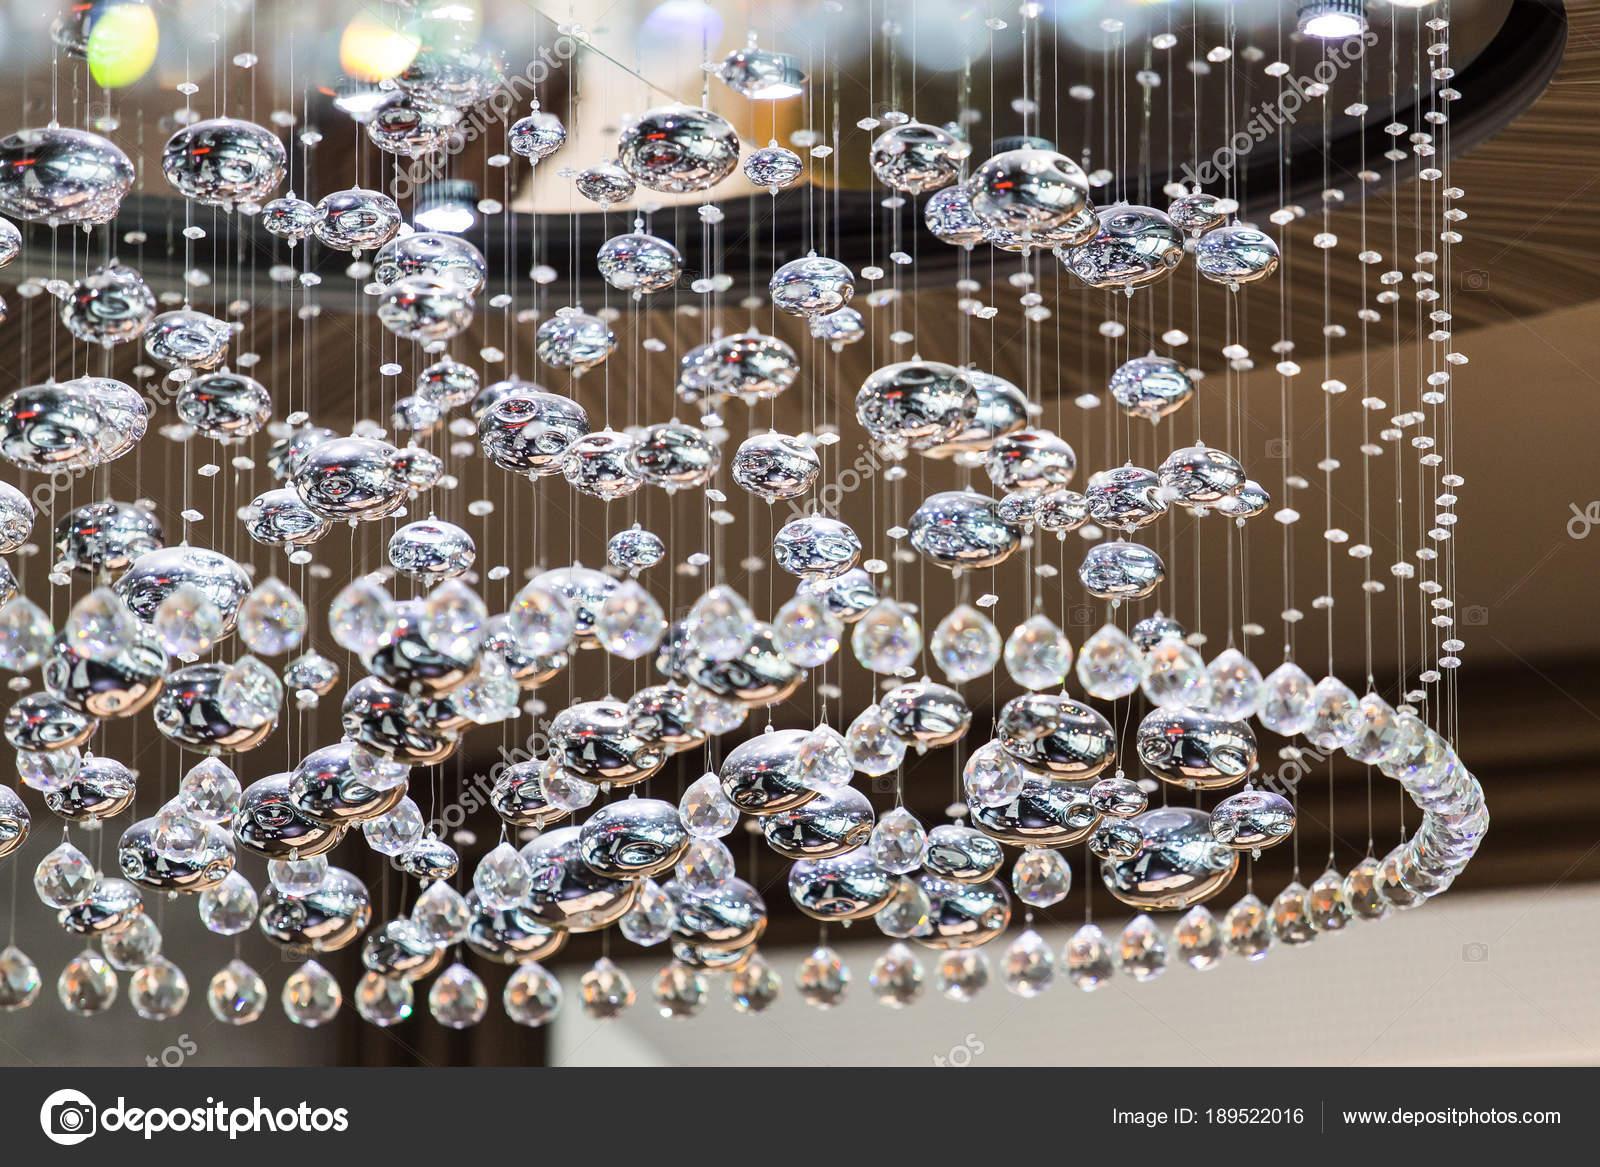 Kronleuchter Kristall Silber ~ Wie reinigt man kronleuchter kronleuchter und lüster finden